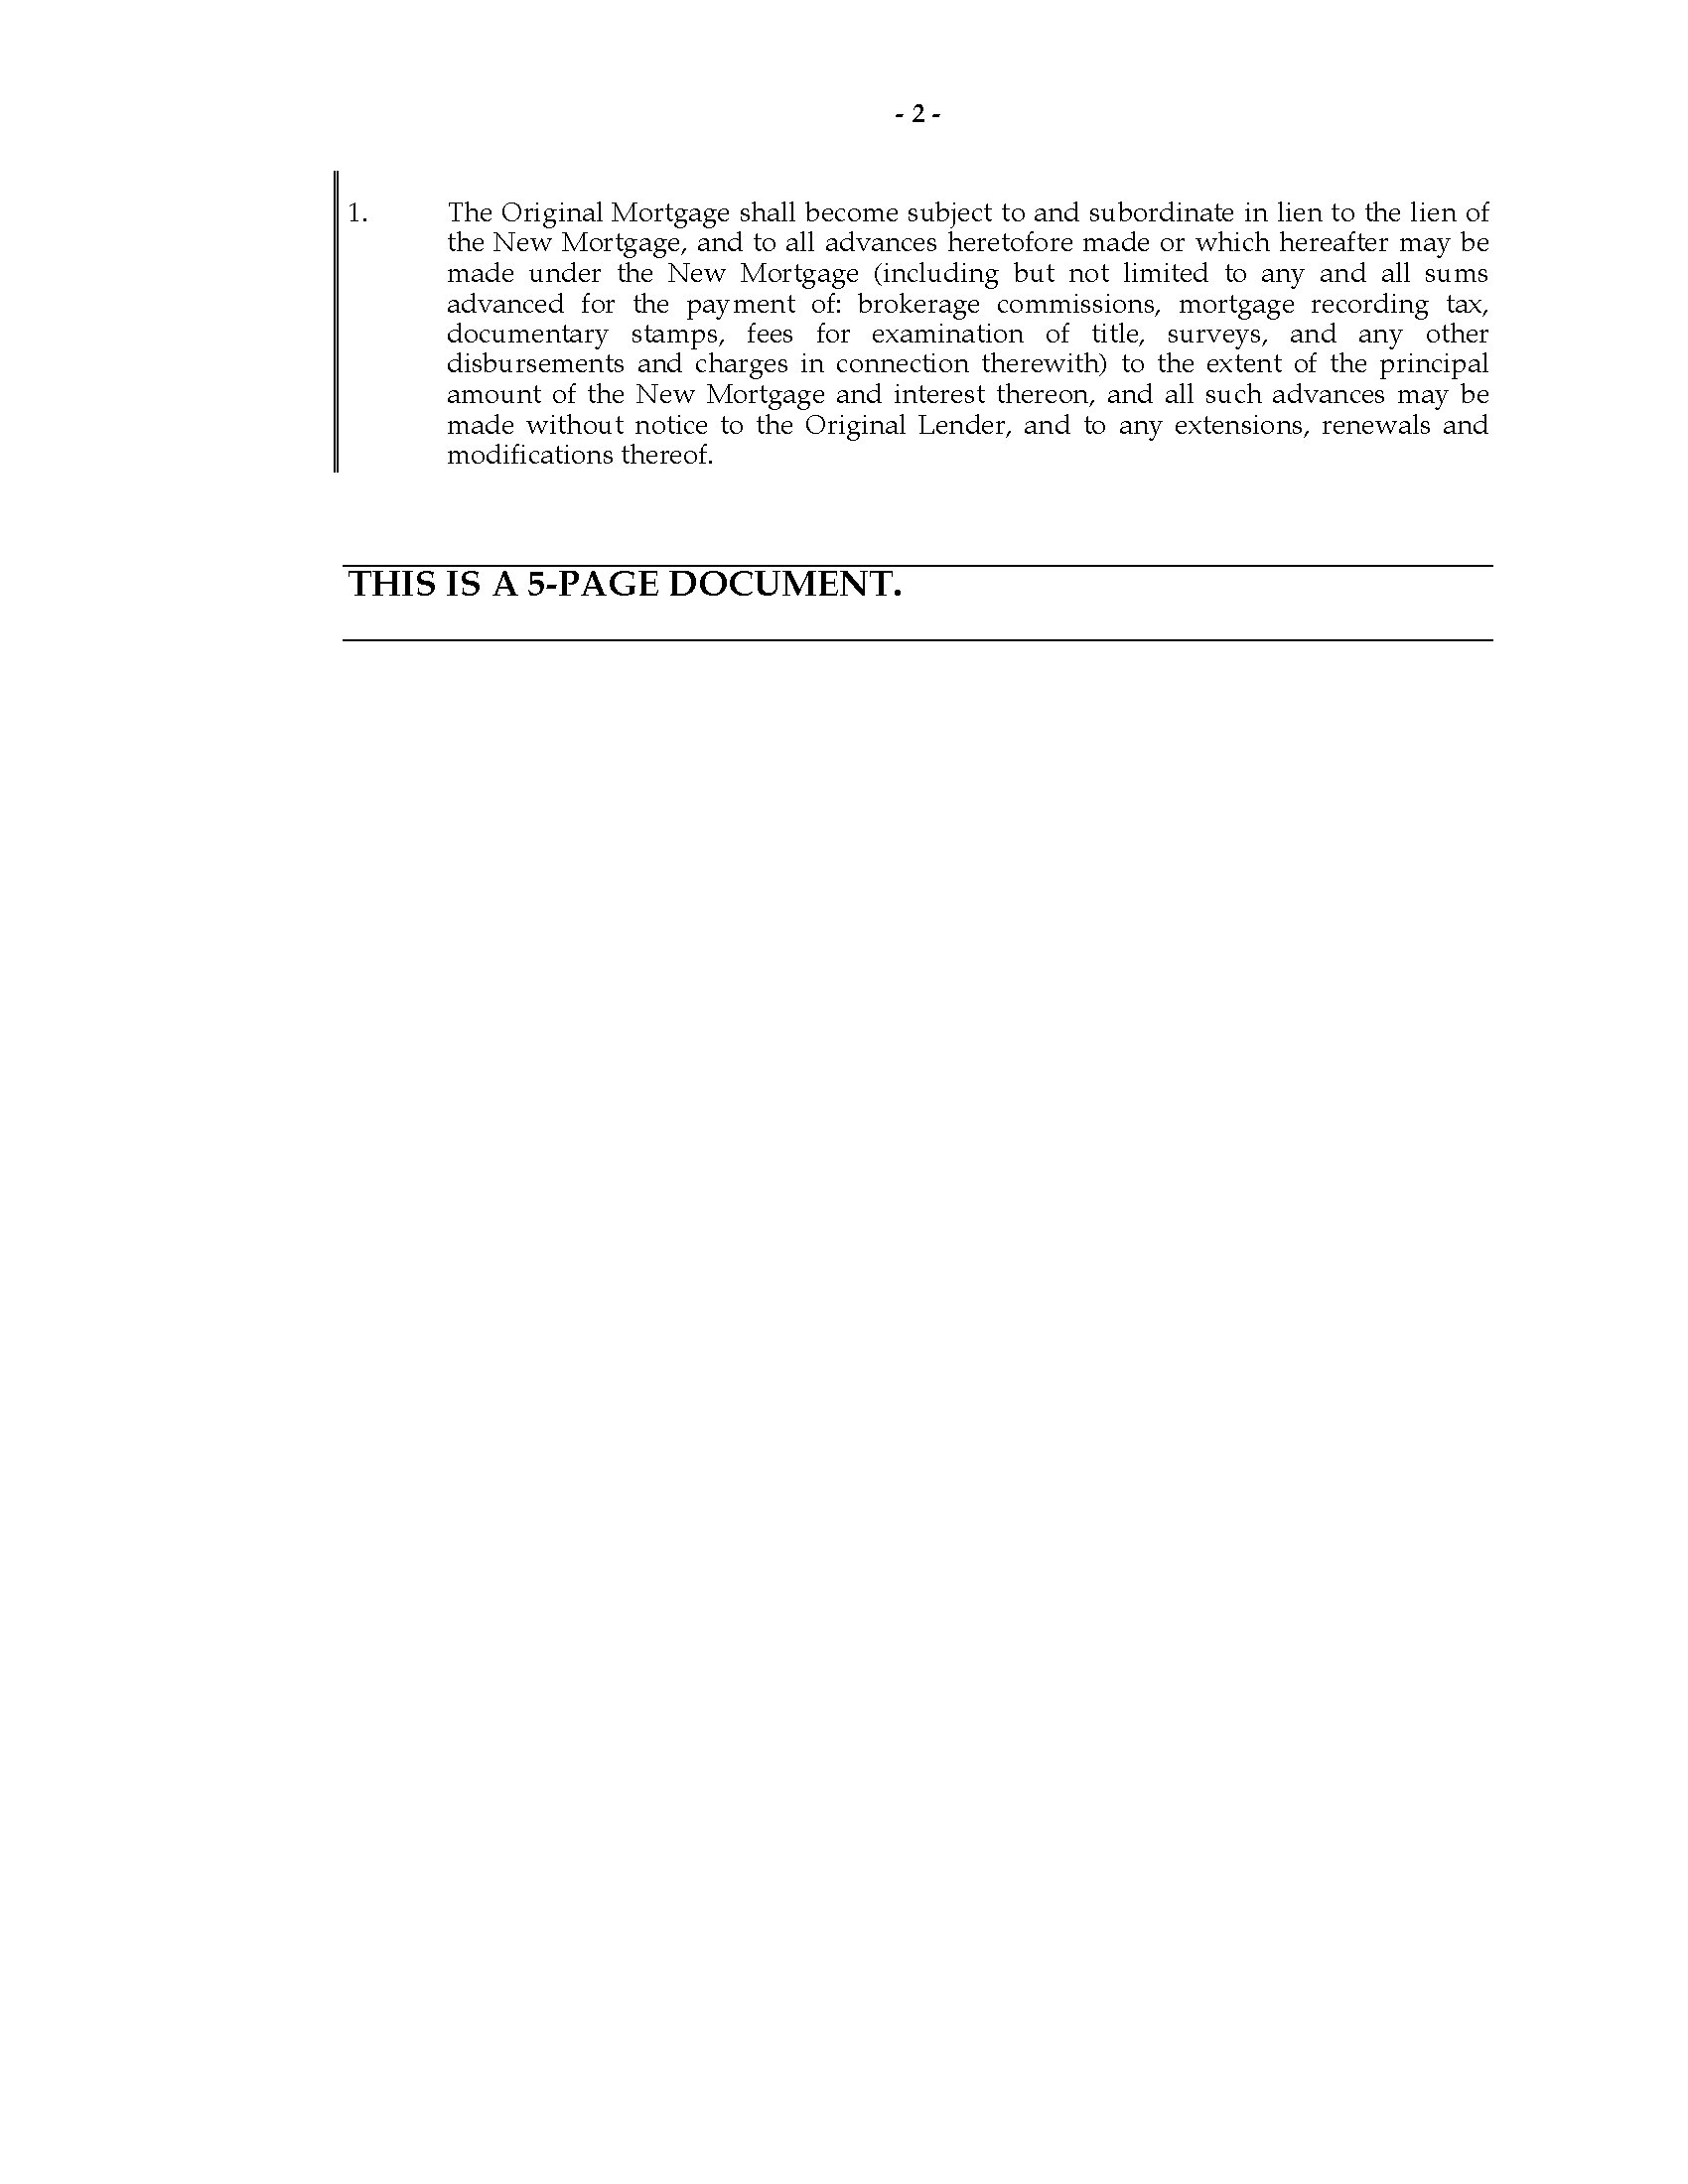 Subordination Agreement Definition Images Agreement Example Ideas Ucc Subordination  Agreement Image Collections Agreement Example Subordination Agreement